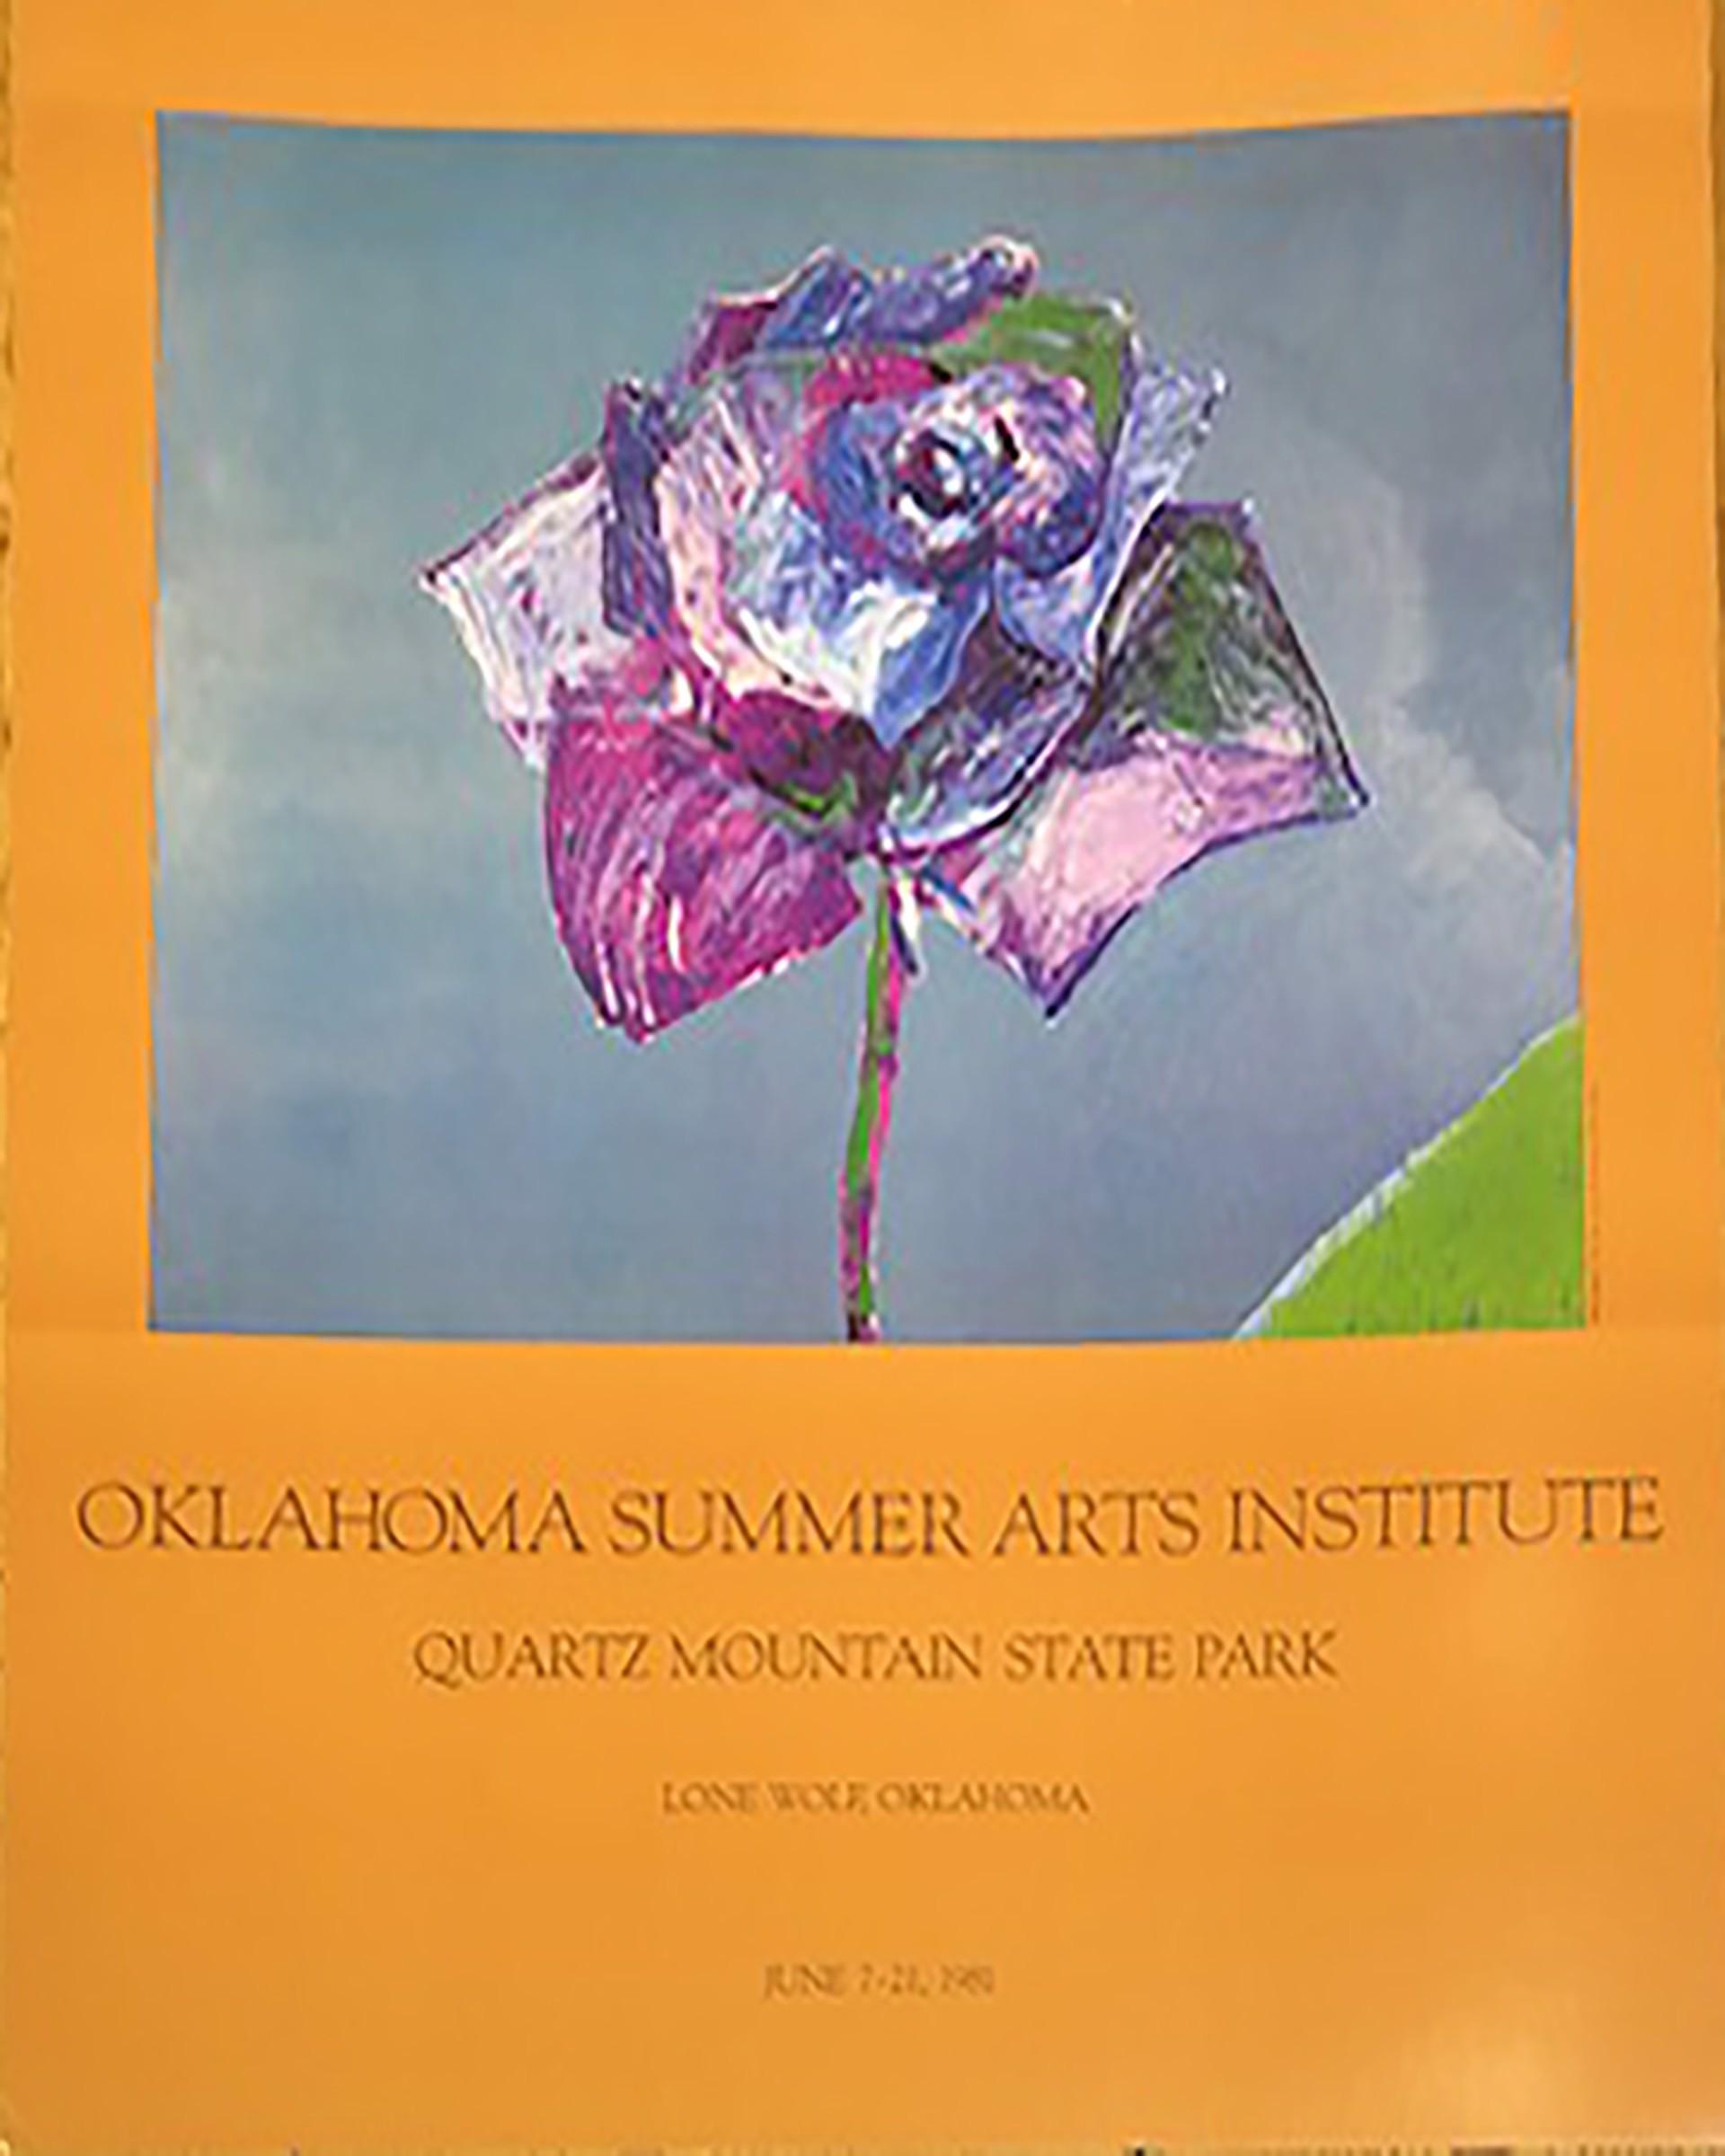 Oklahoma Summer Arts Institute by Fritz Scholder